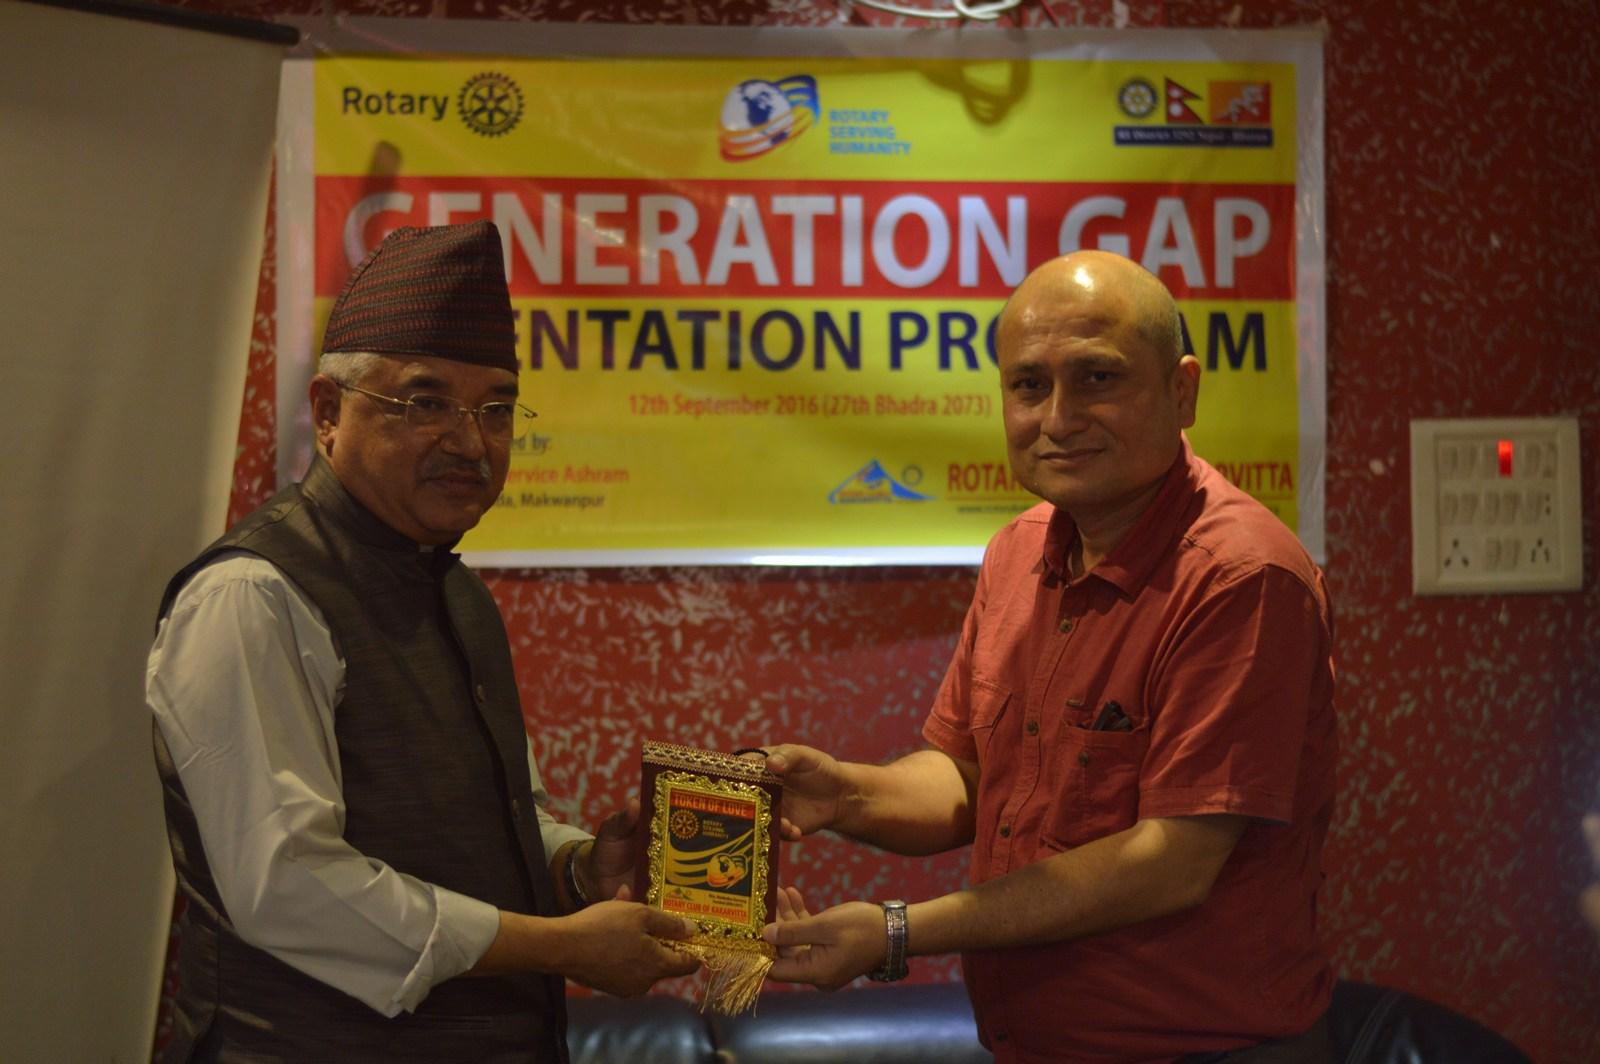 Generation-Gap-Orientation-Program-Rotary-Club-of-Kakarvitta-30